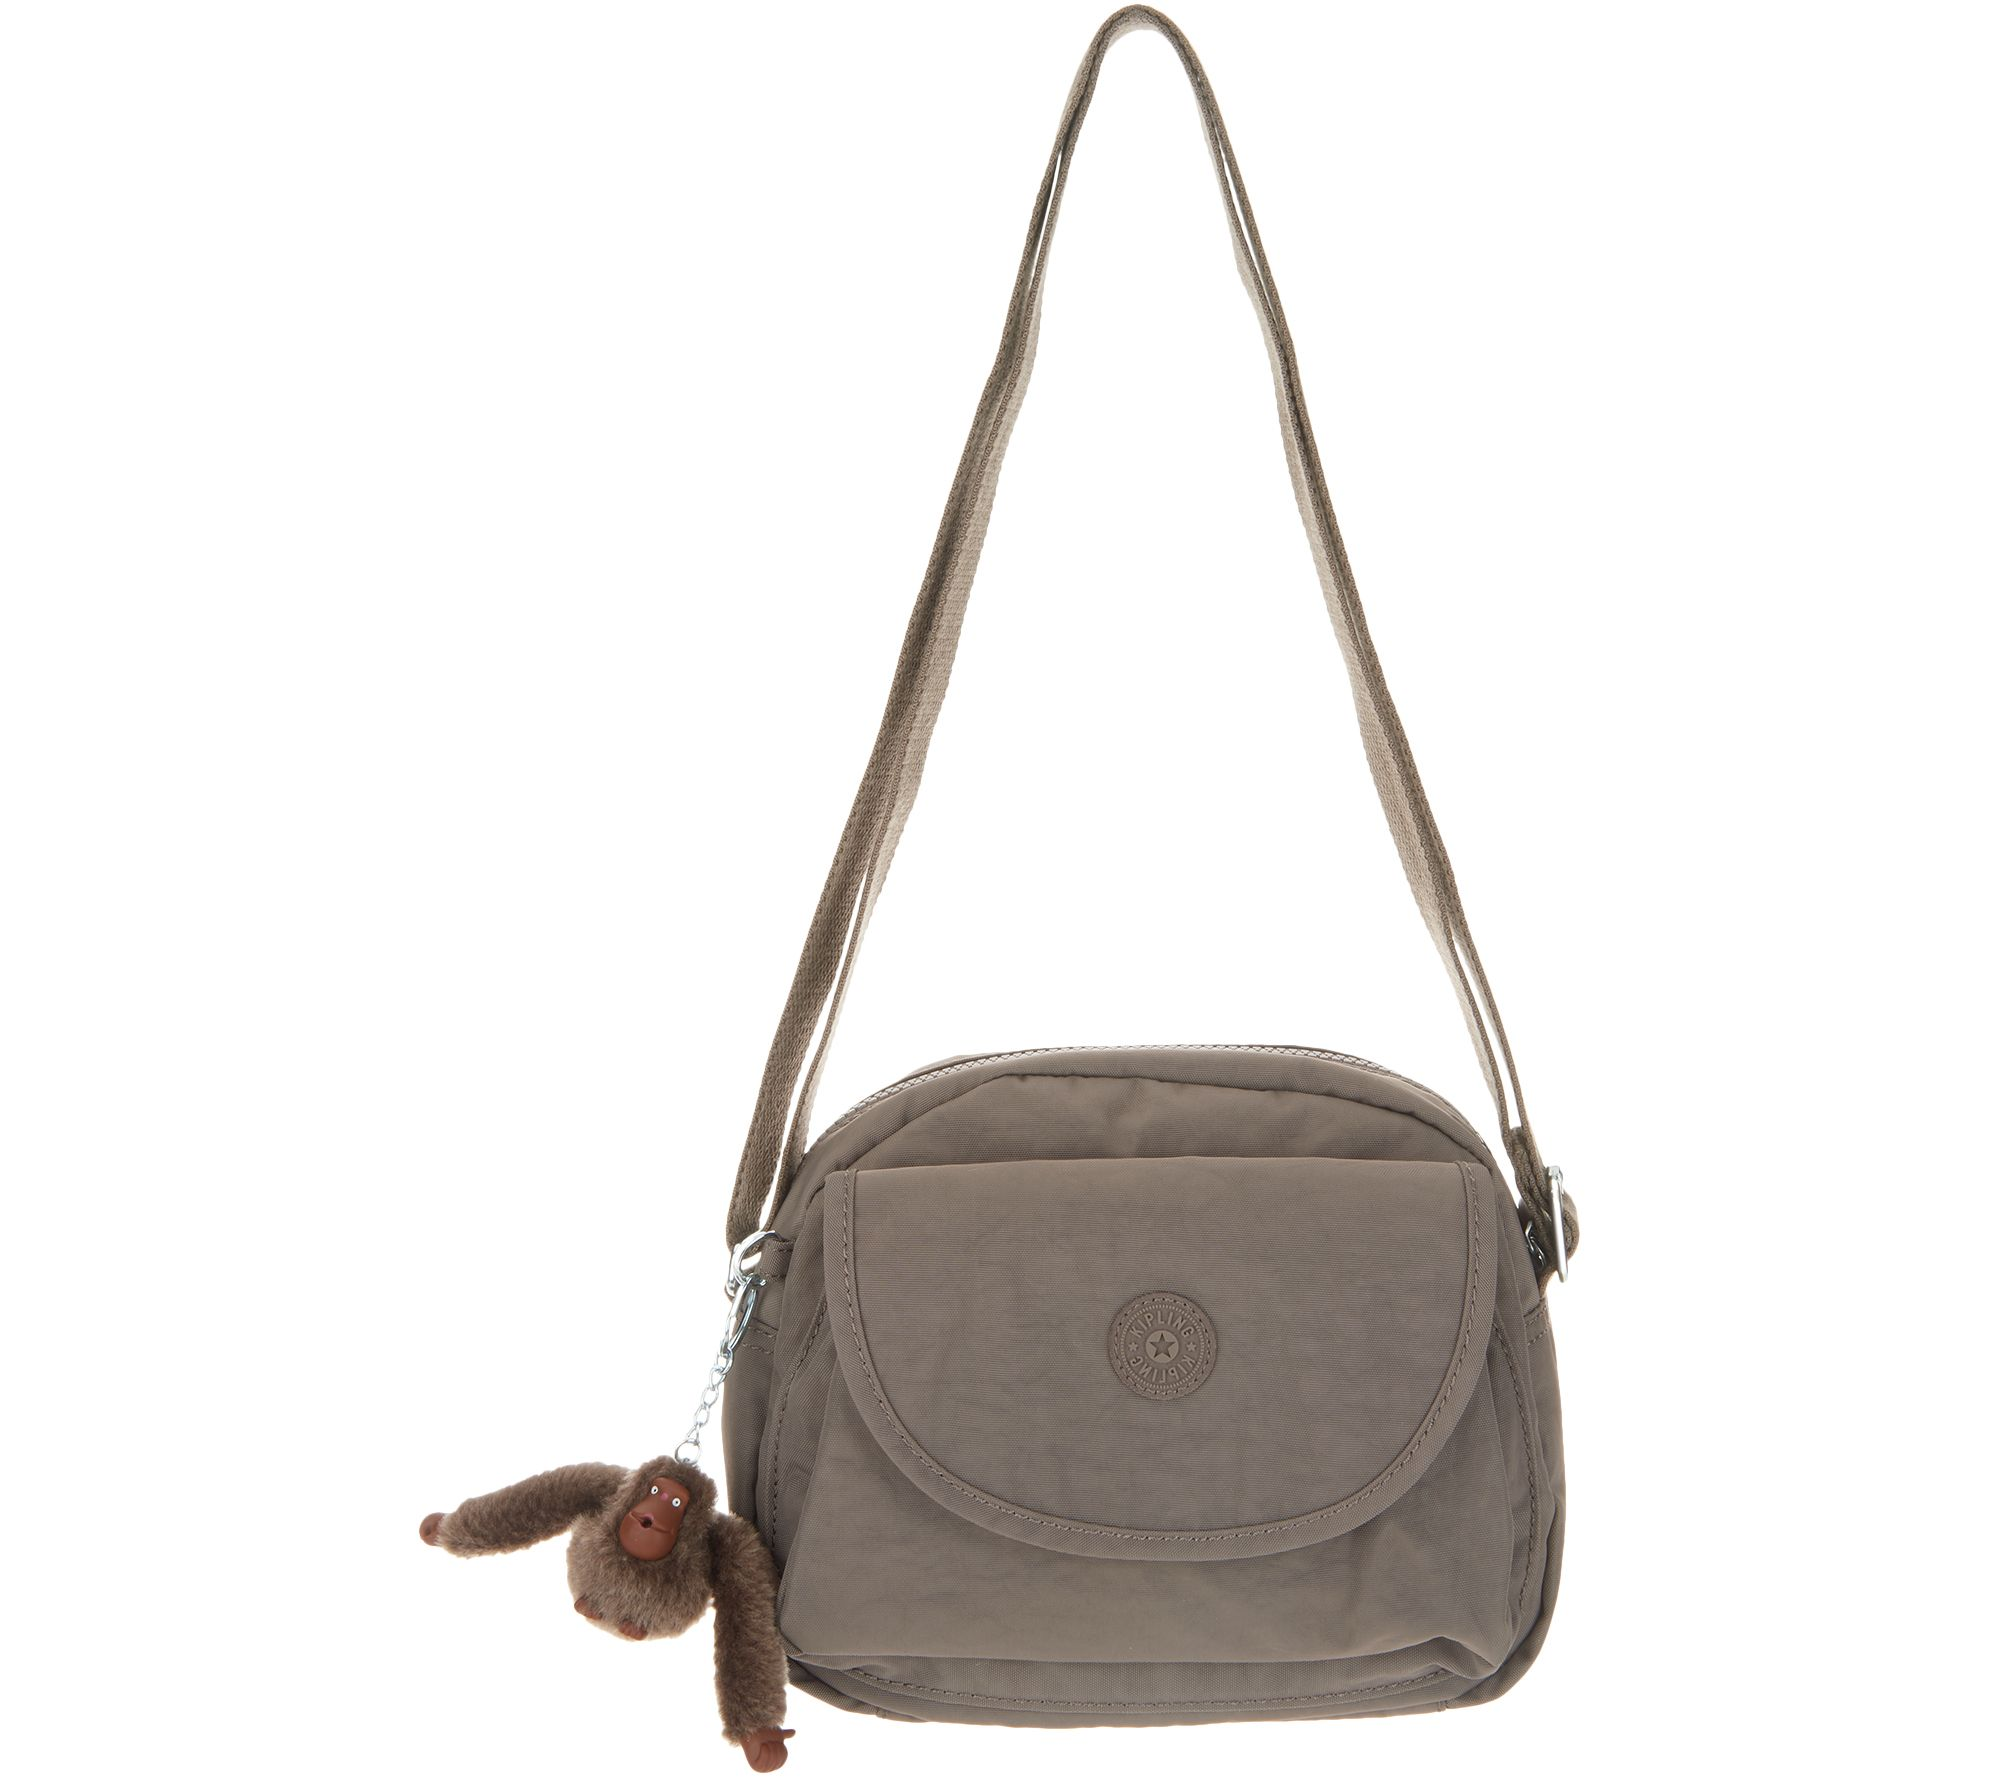 901738b88dd Kipling Small Adjustable Crossbody Bag - Stelma - Page 1 — QVC.com